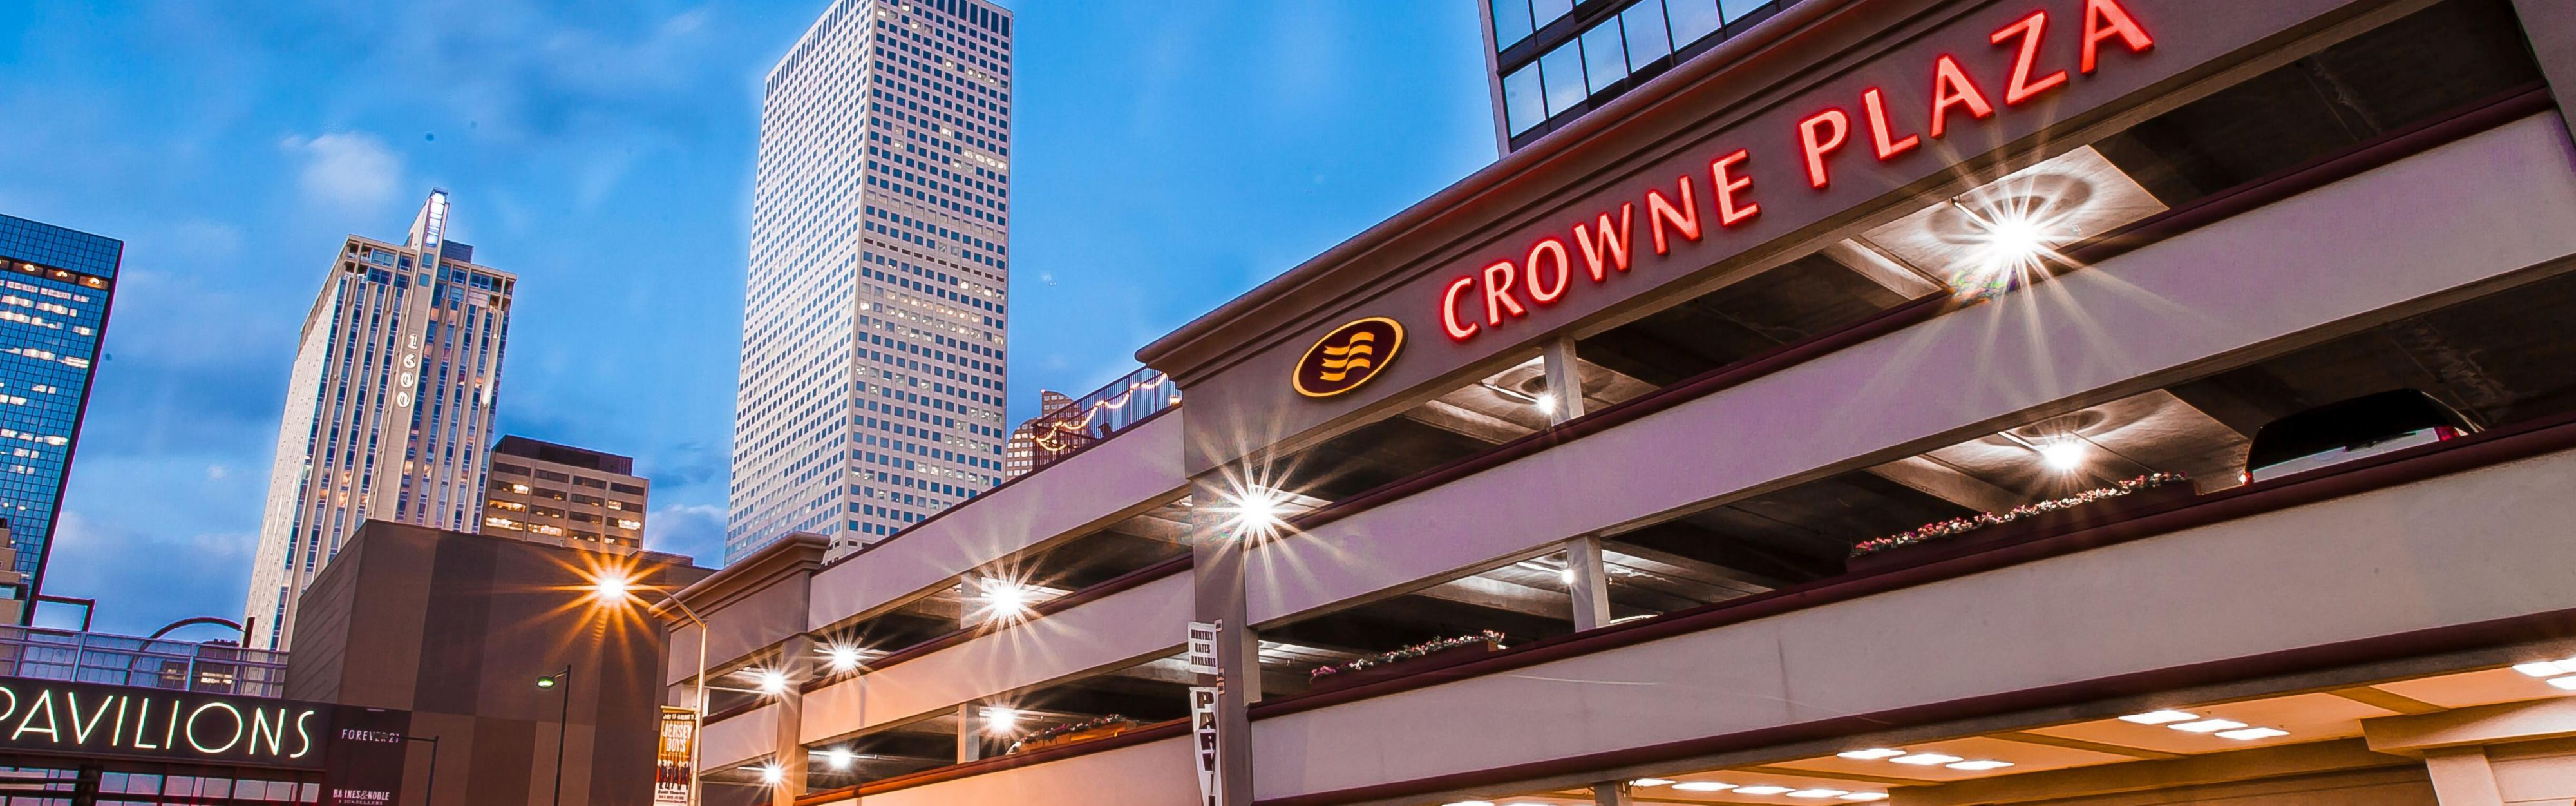 Crowne Plaza Hotel Downtown Denver Colorado